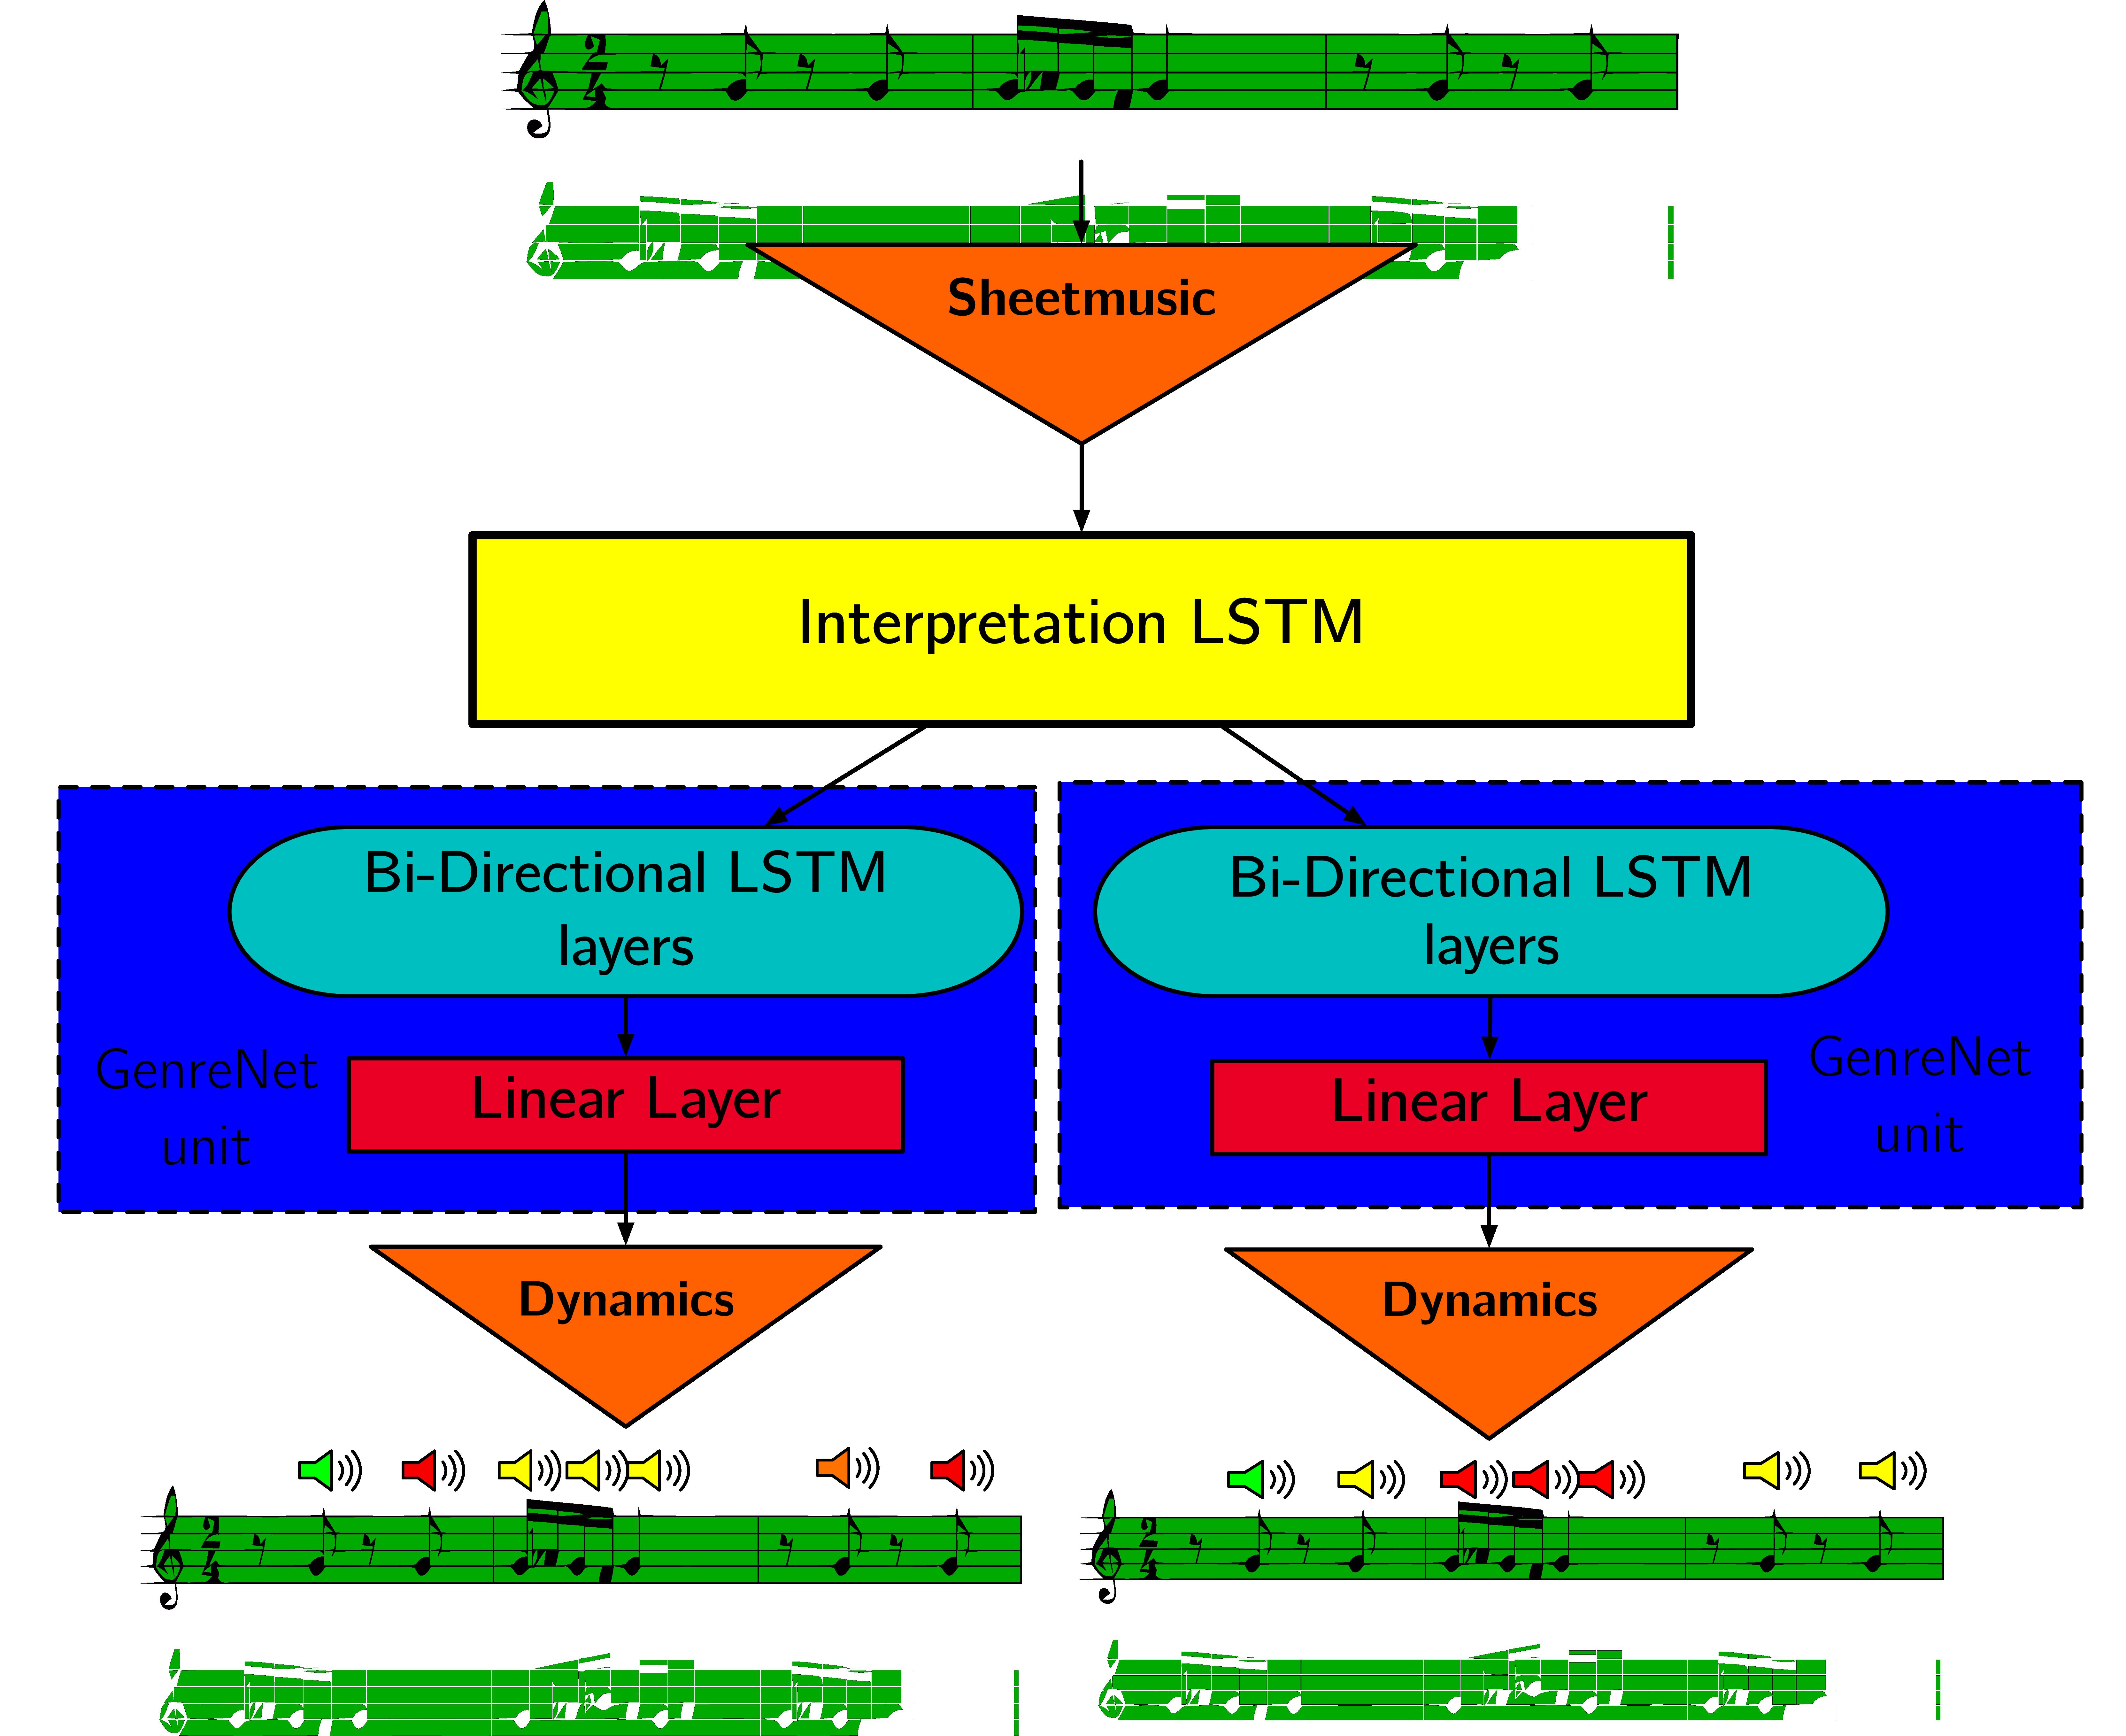 GitHub - imalikshake/StyleNet: A cute multi-layer LSTM that